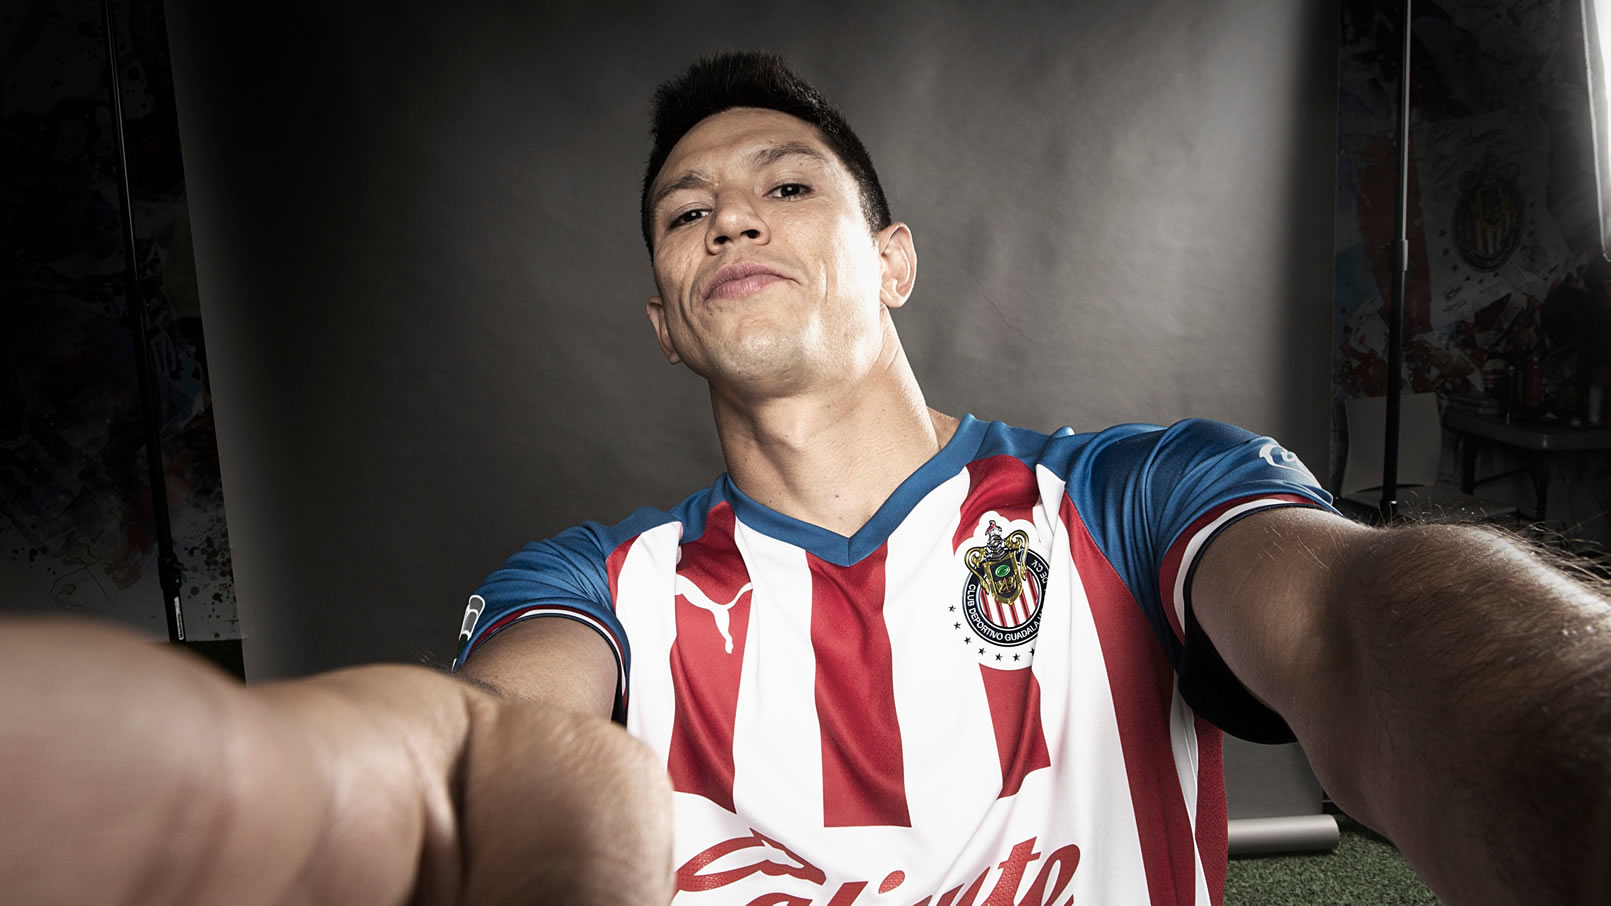 Camiseta local de las Chivas de Guadalajara 2019/20 | Imagen Puma